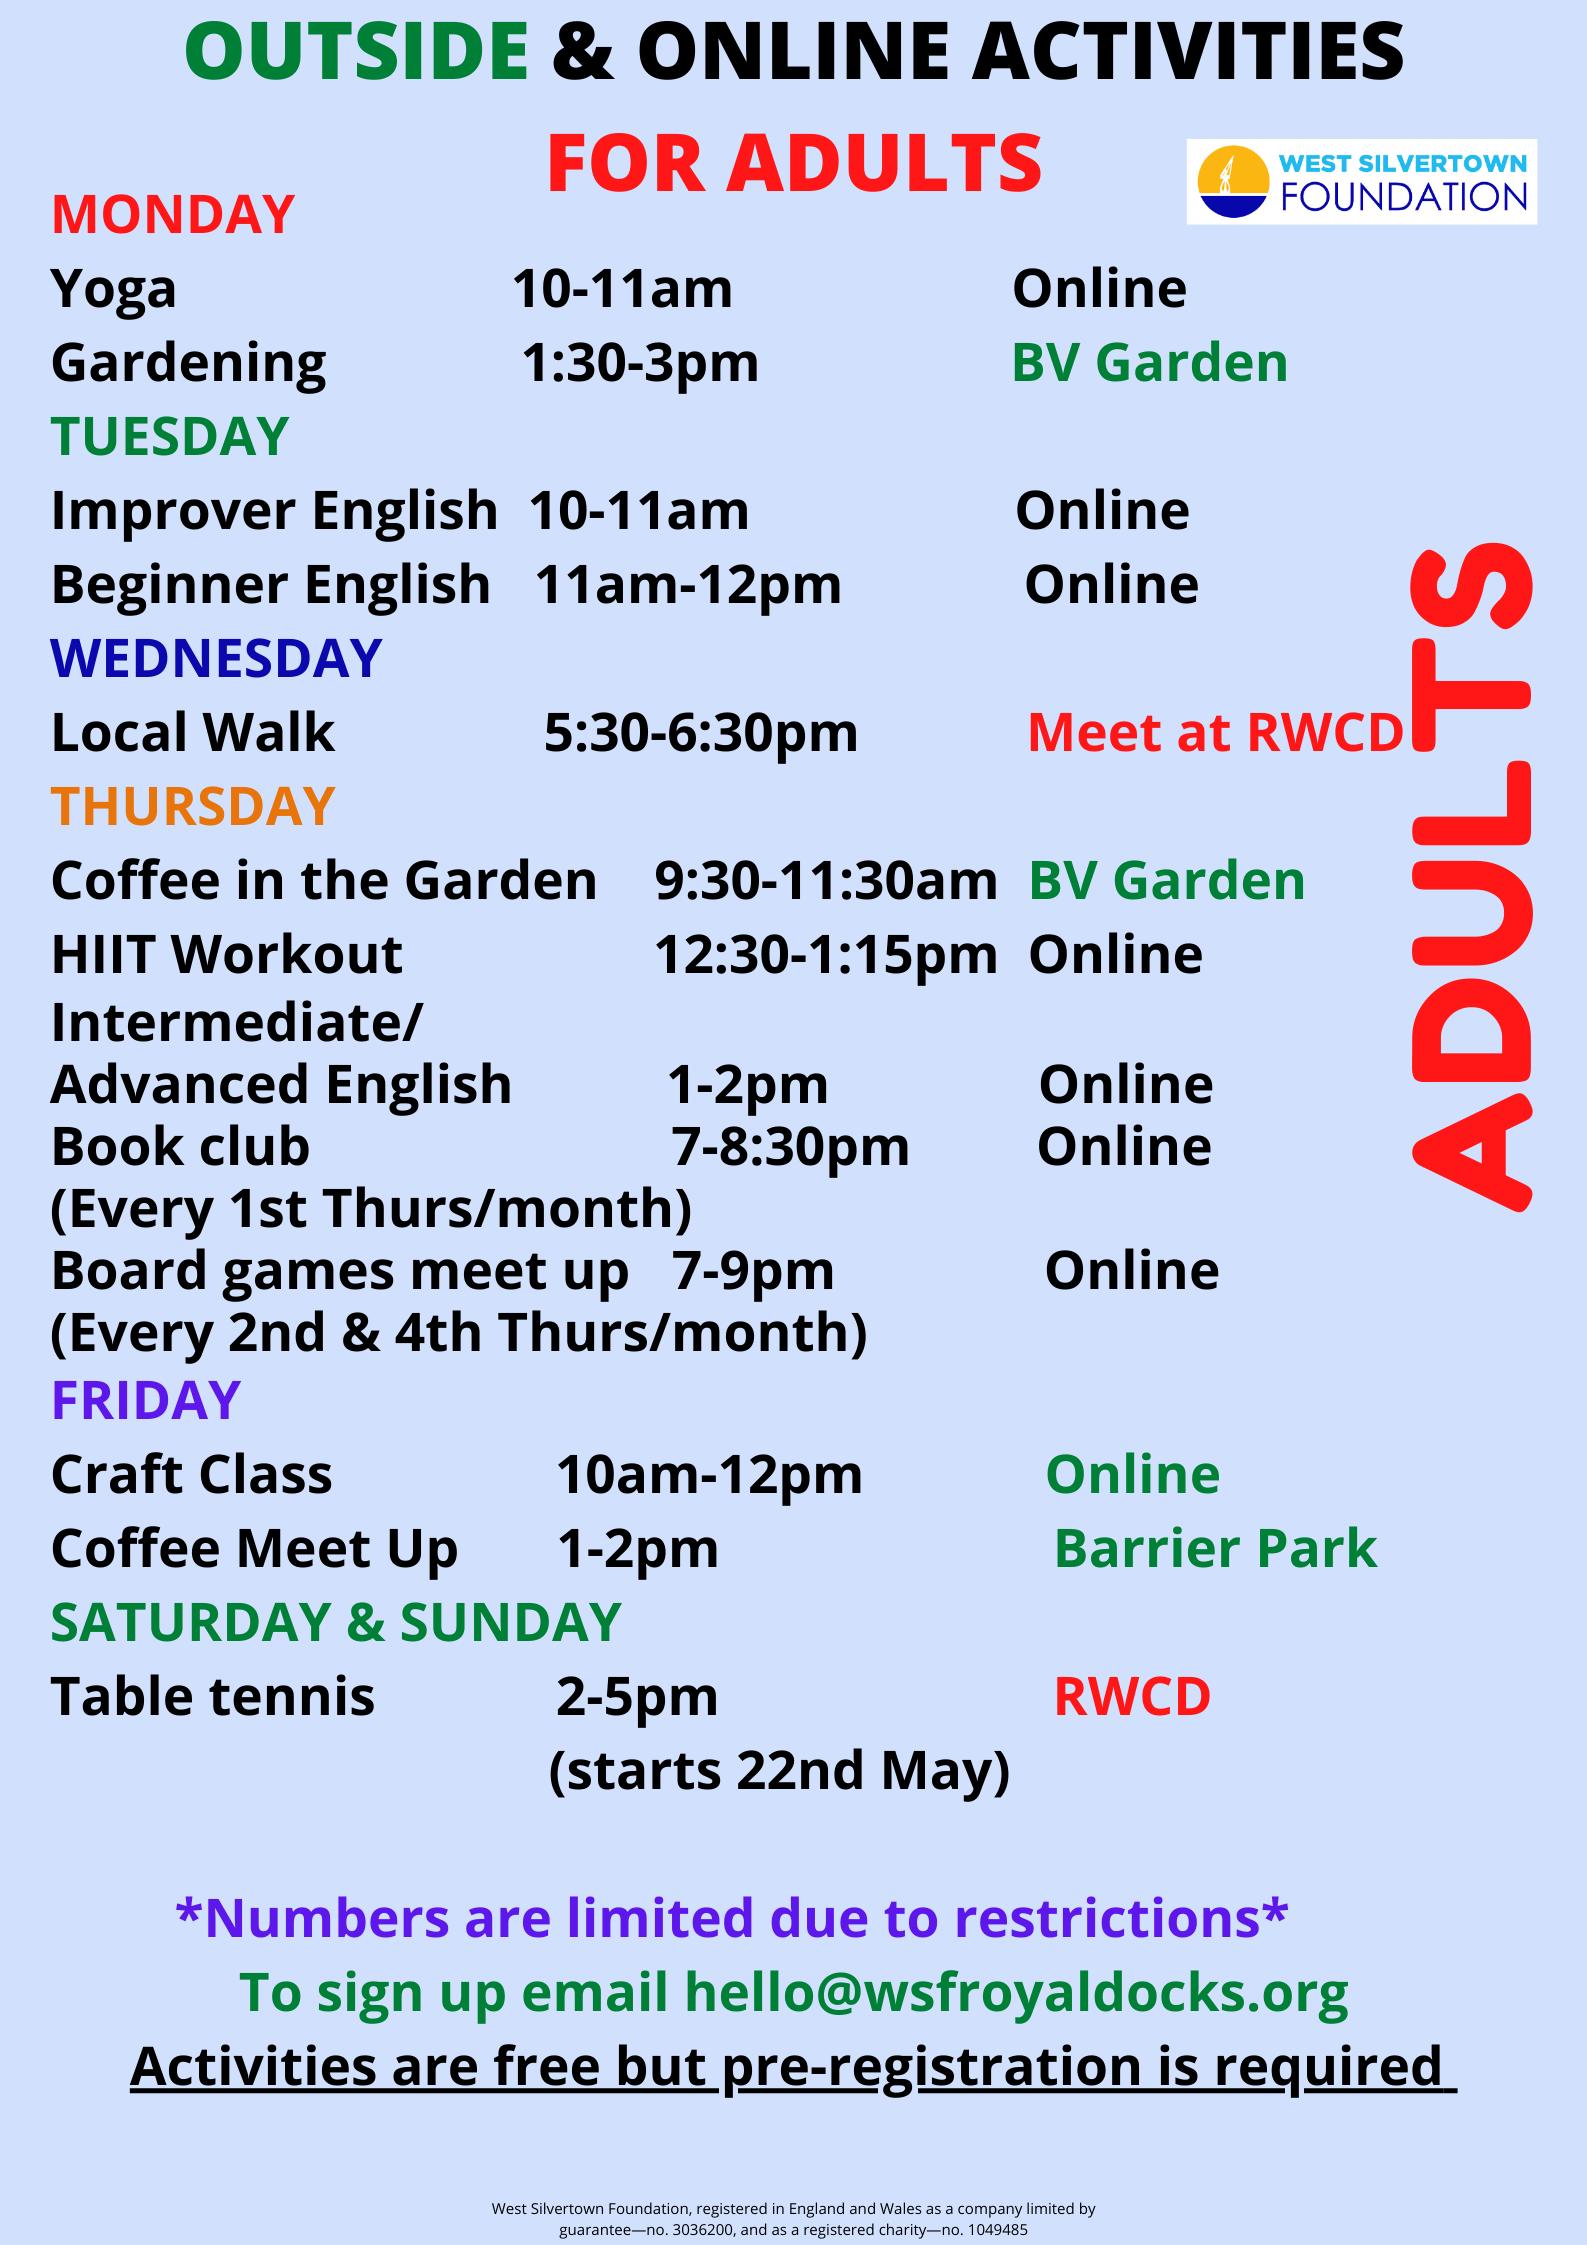 Adult activities April 21